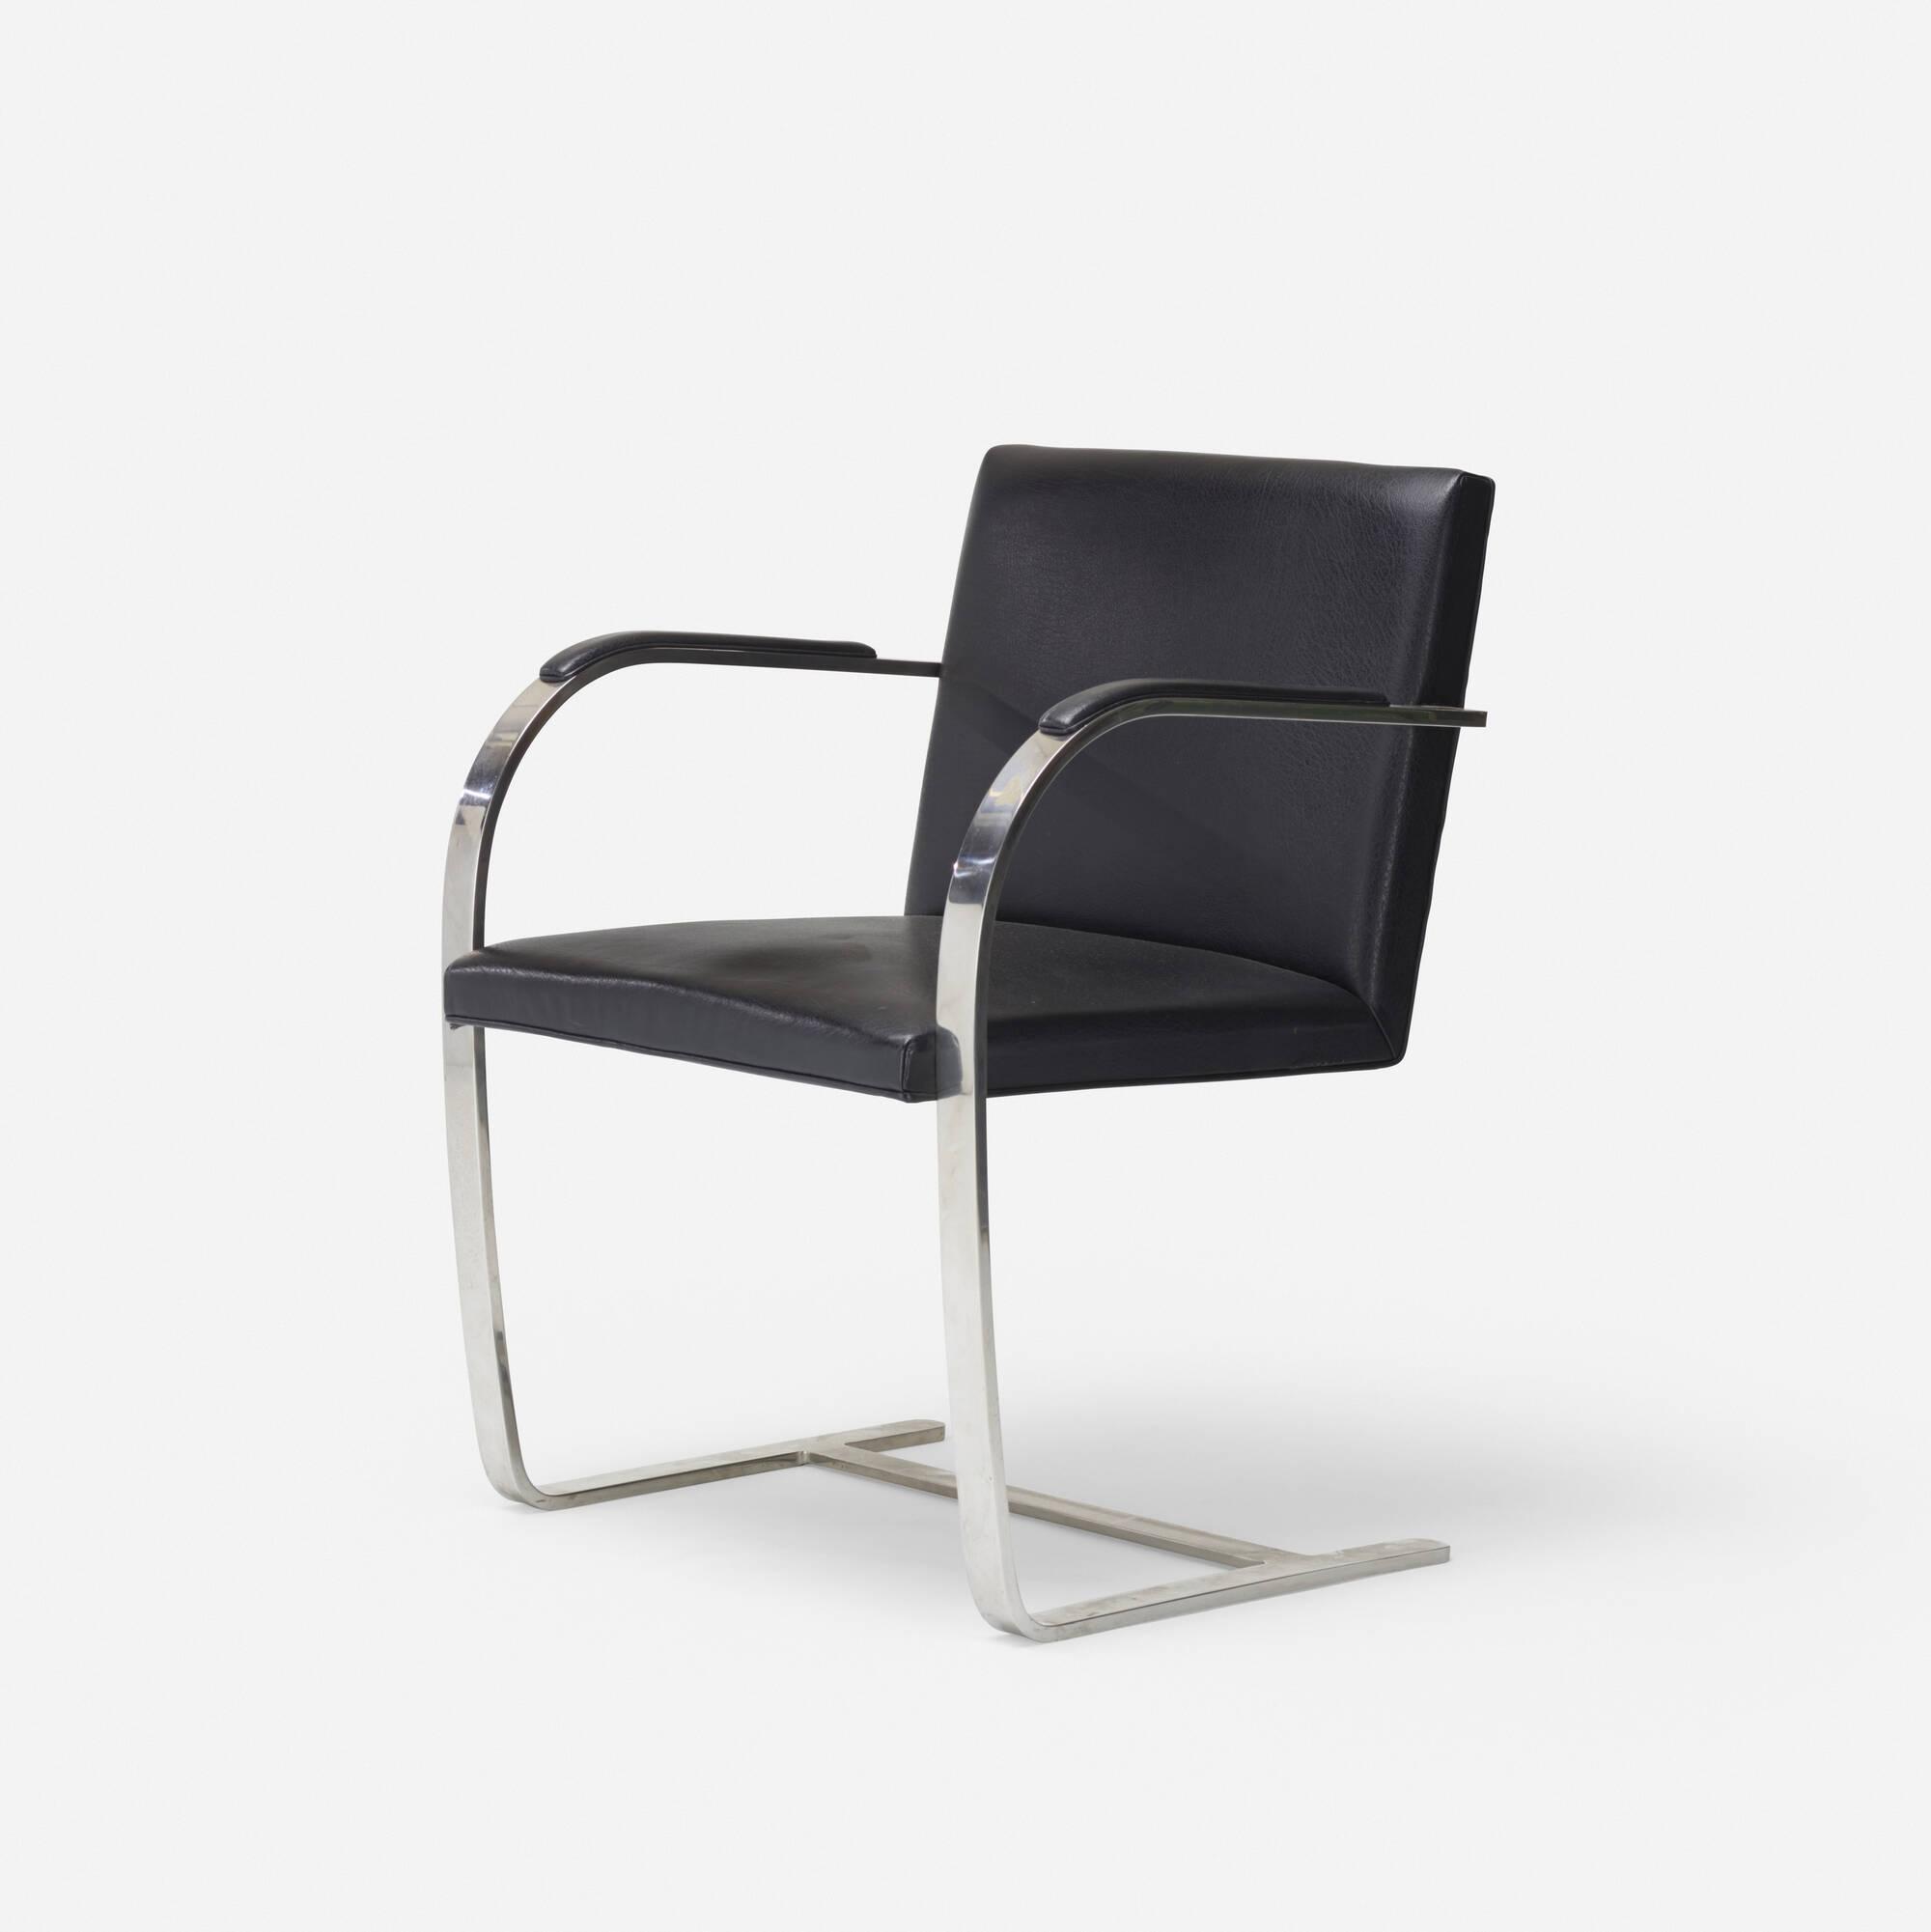 570: Ludwig Mies van der Rohe / Brno chair (1 of 2)